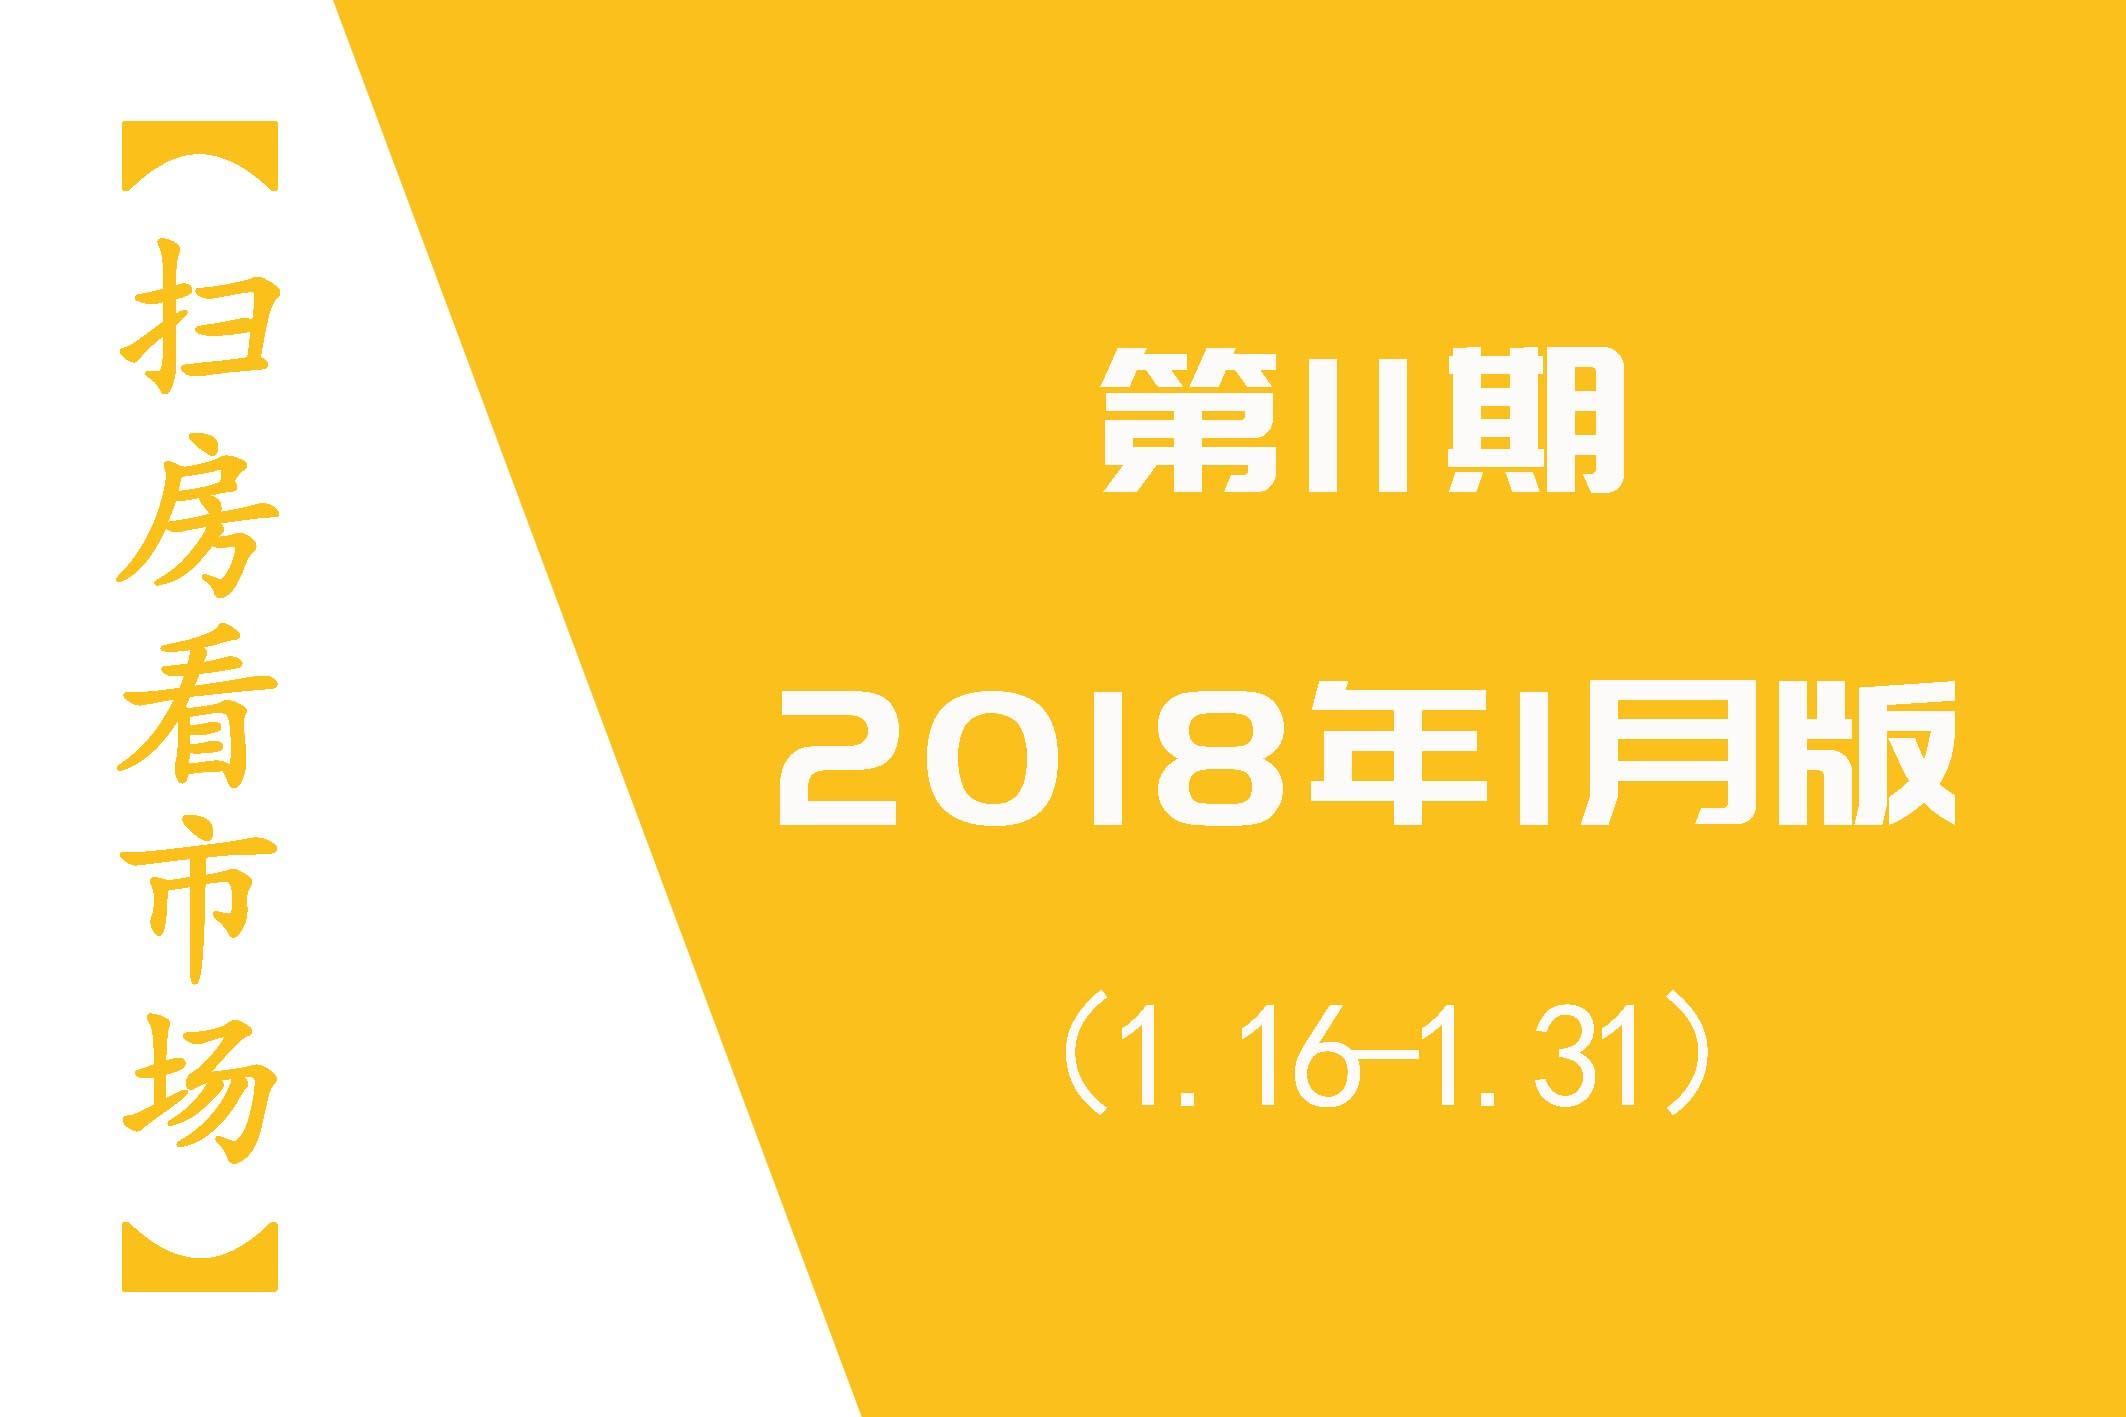 http://img.saofang.cn/new/distrib/areadelegate/12/marketing/20180202/20180202_Lhd1TydVG2.jpg_news